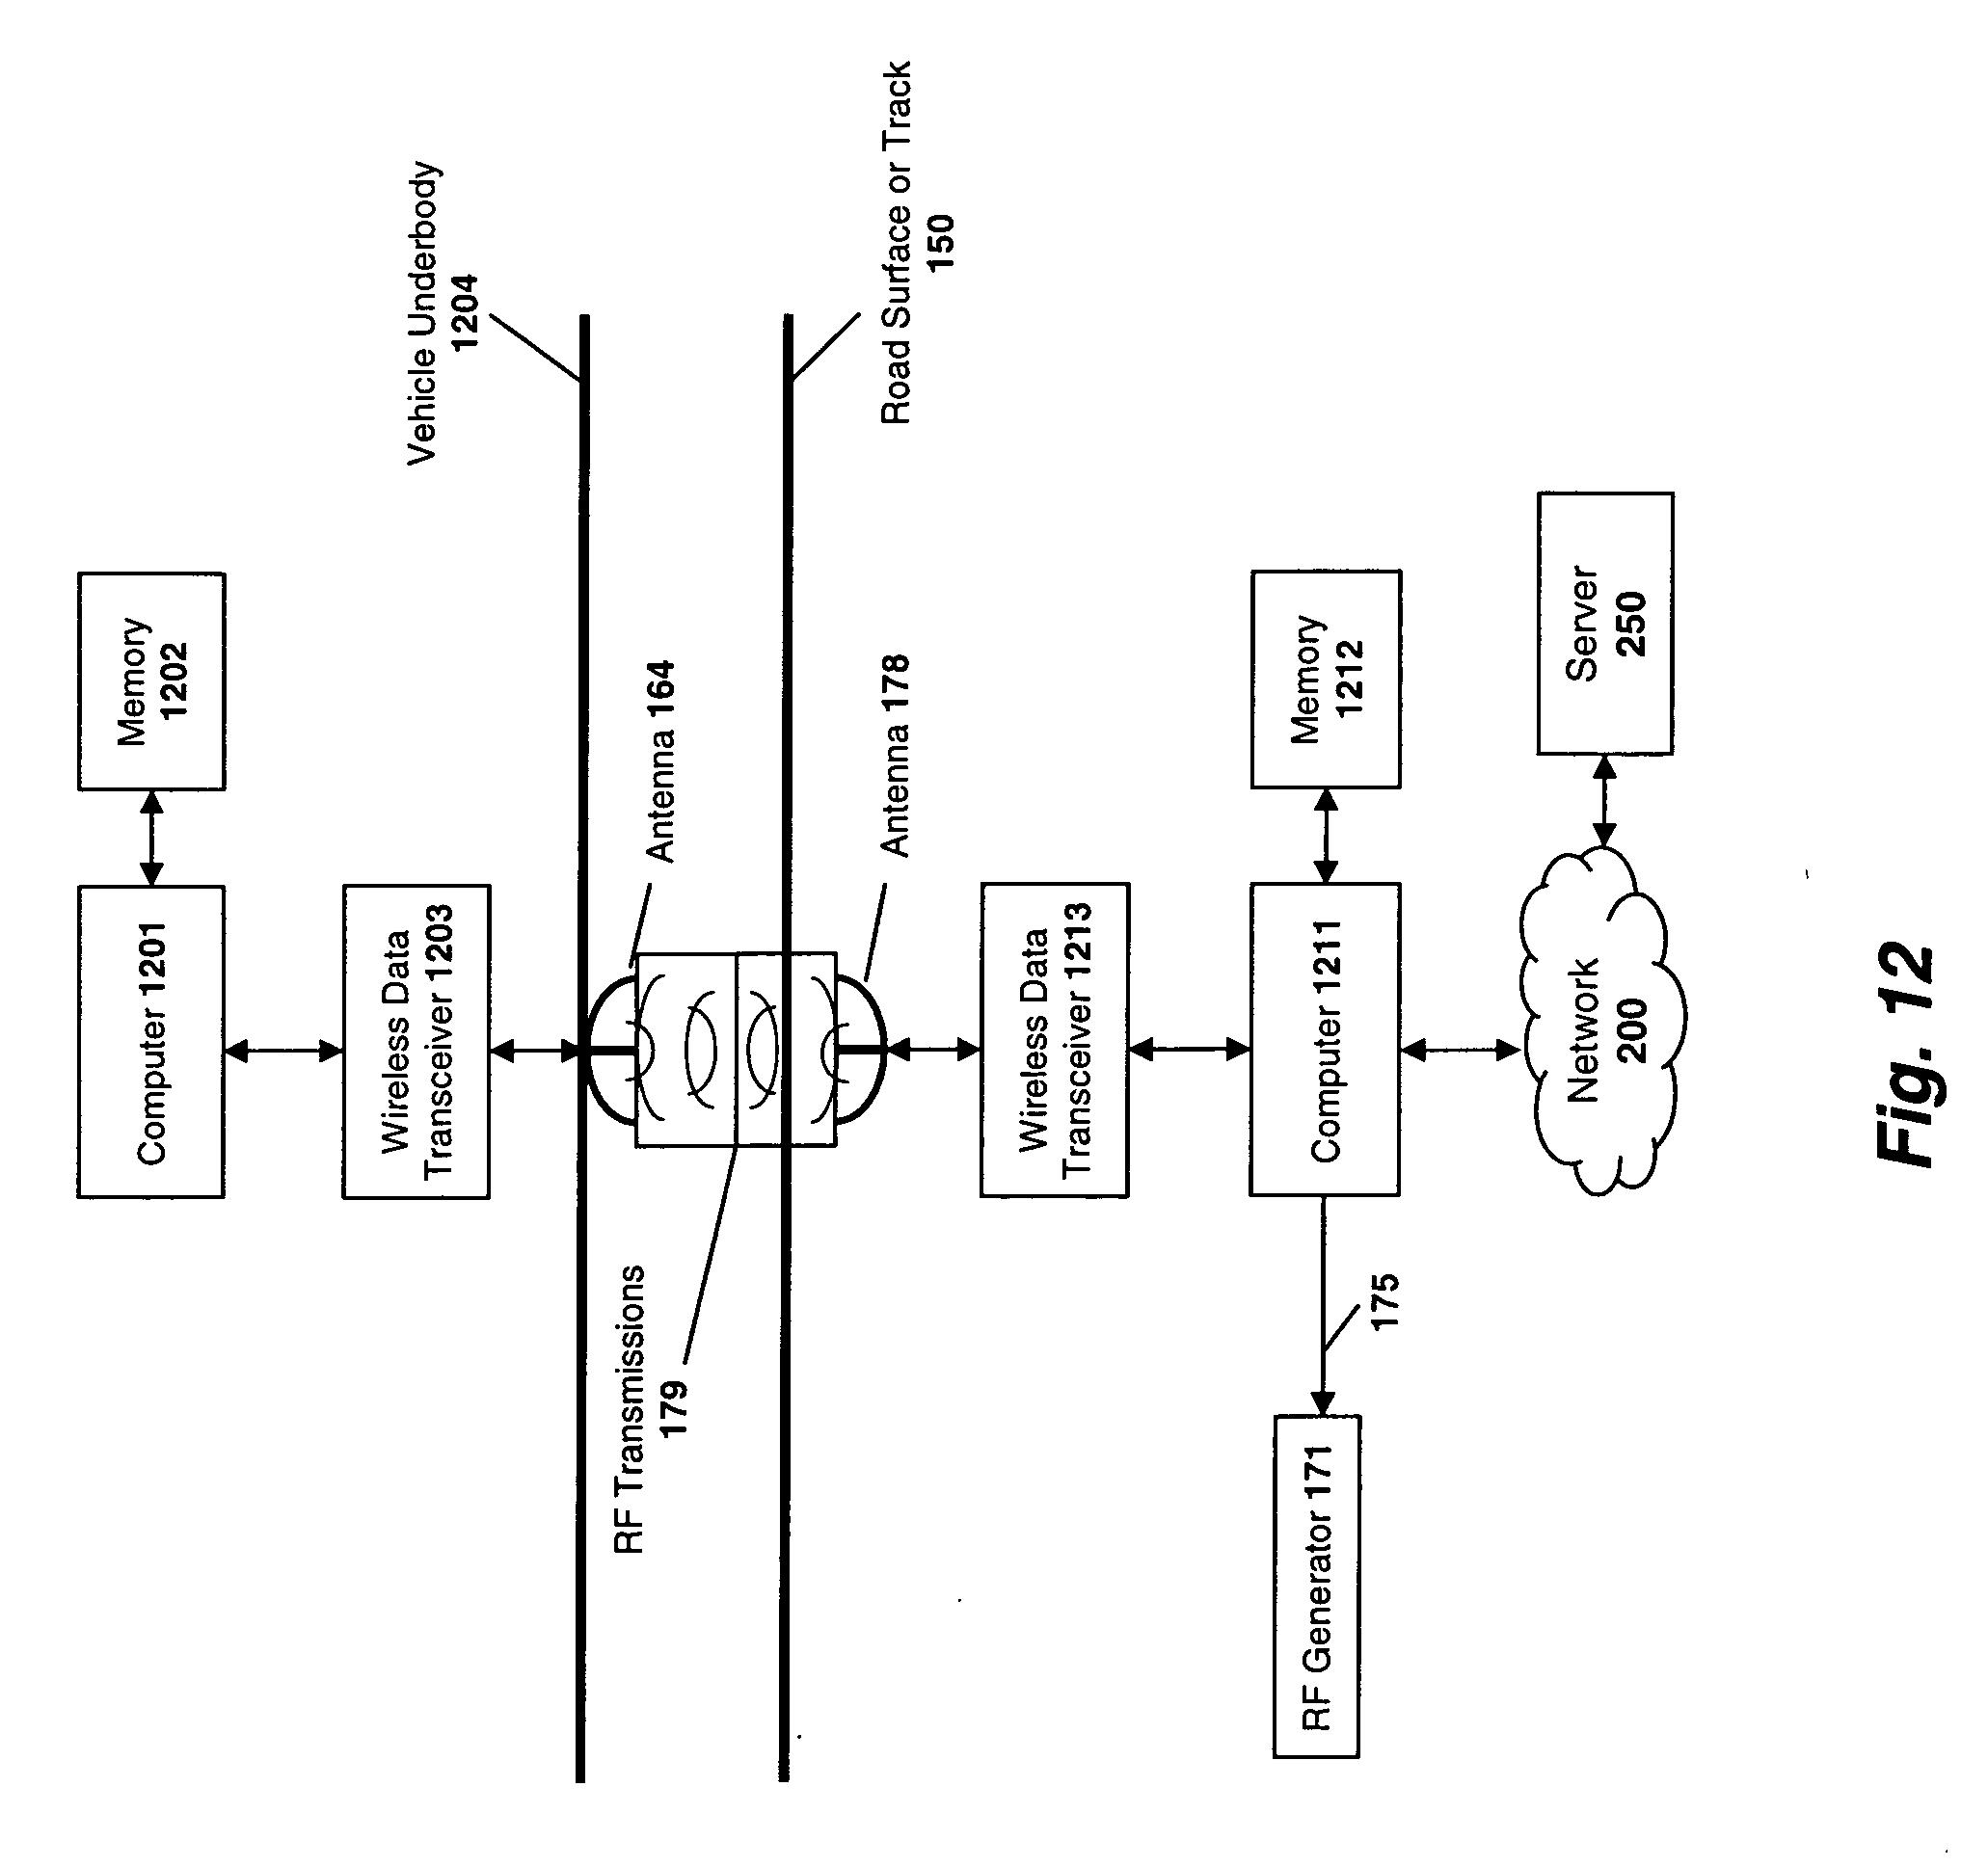 tilt sensor circuit diagram tradeoficcom wiring diagram lap rh 17 tbvcs berufsorientierung emsland mitte de